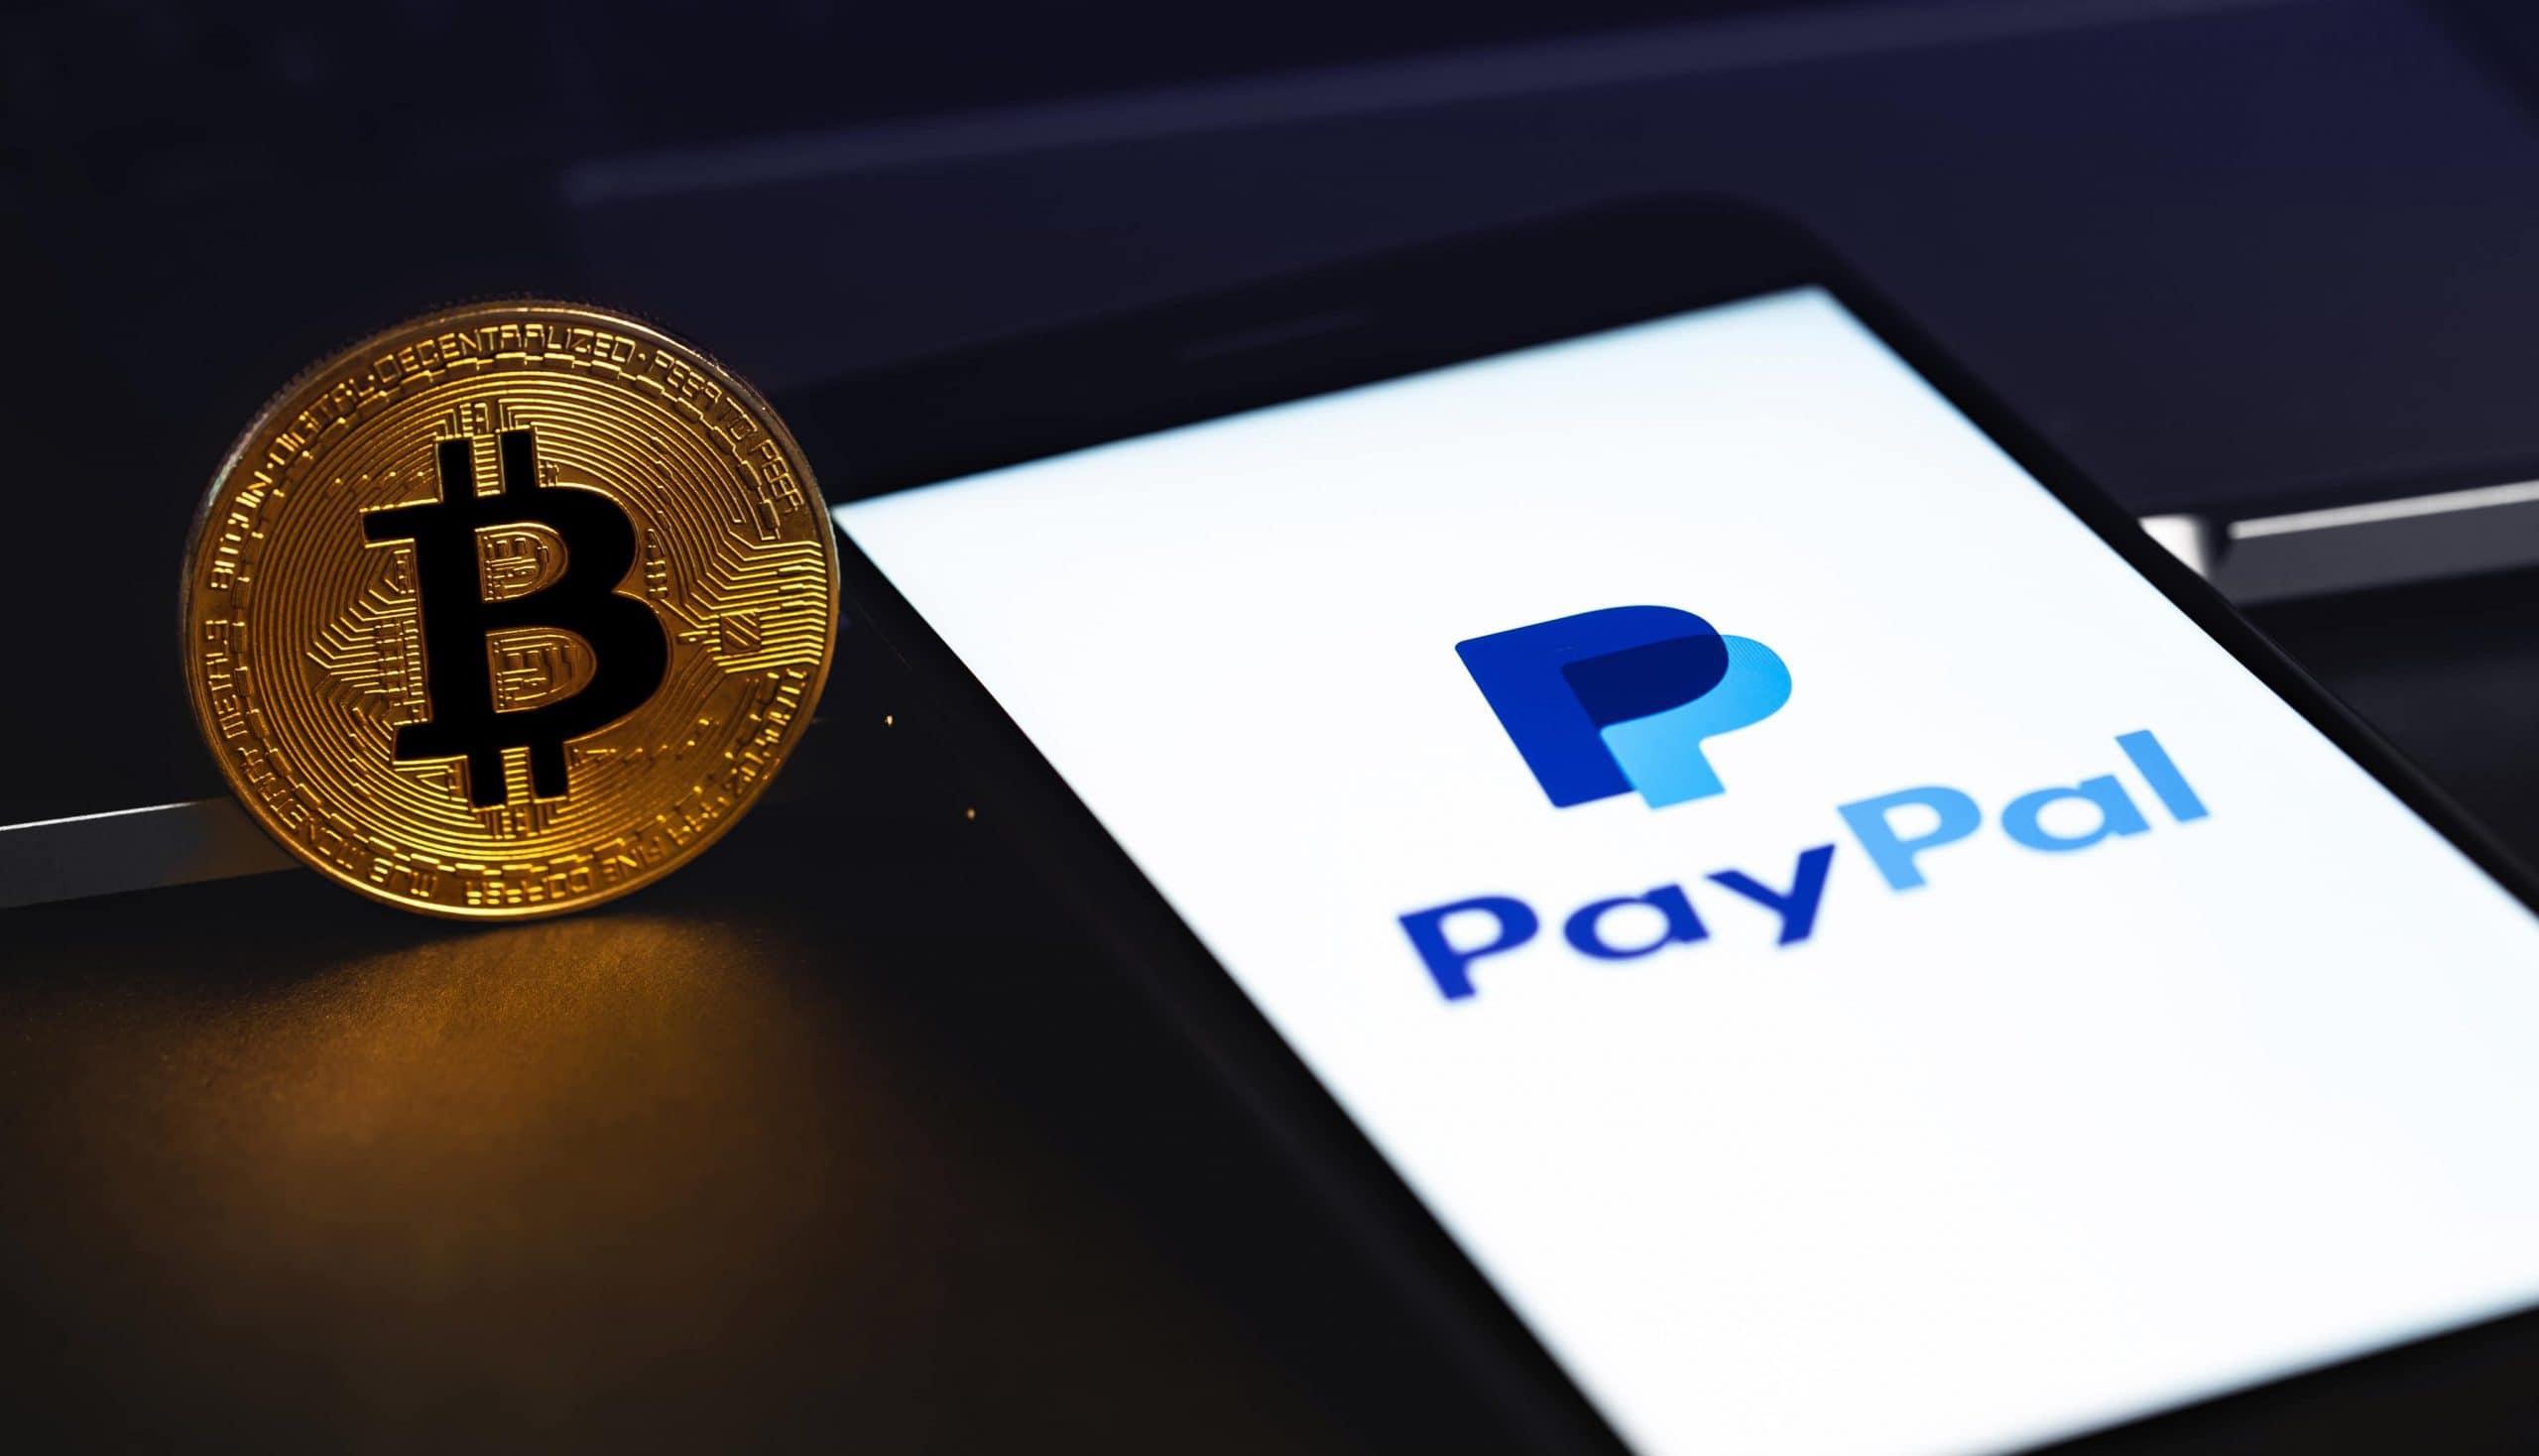 Ebot bitcoins jesse powell bitcoins